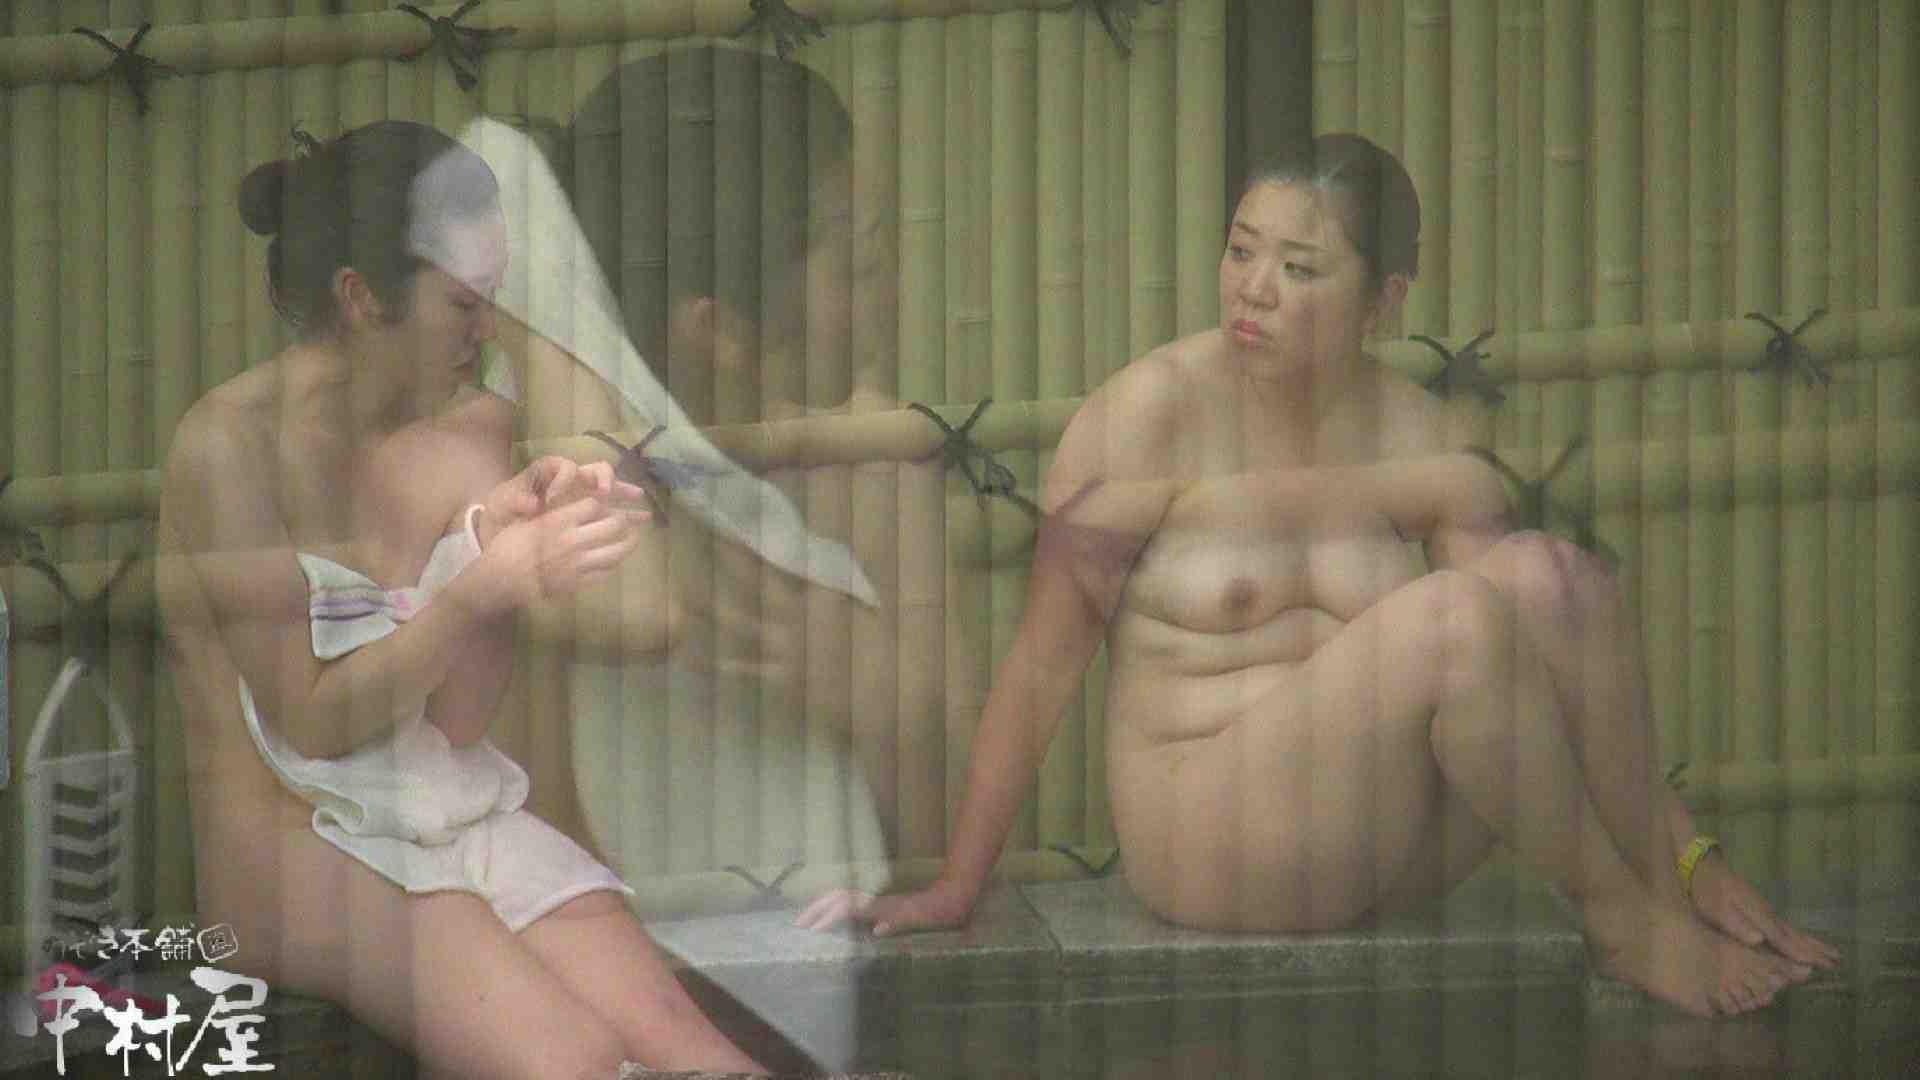 Aquaな露天風呂Vol.917 OLセックス   盗撮  102画像 7